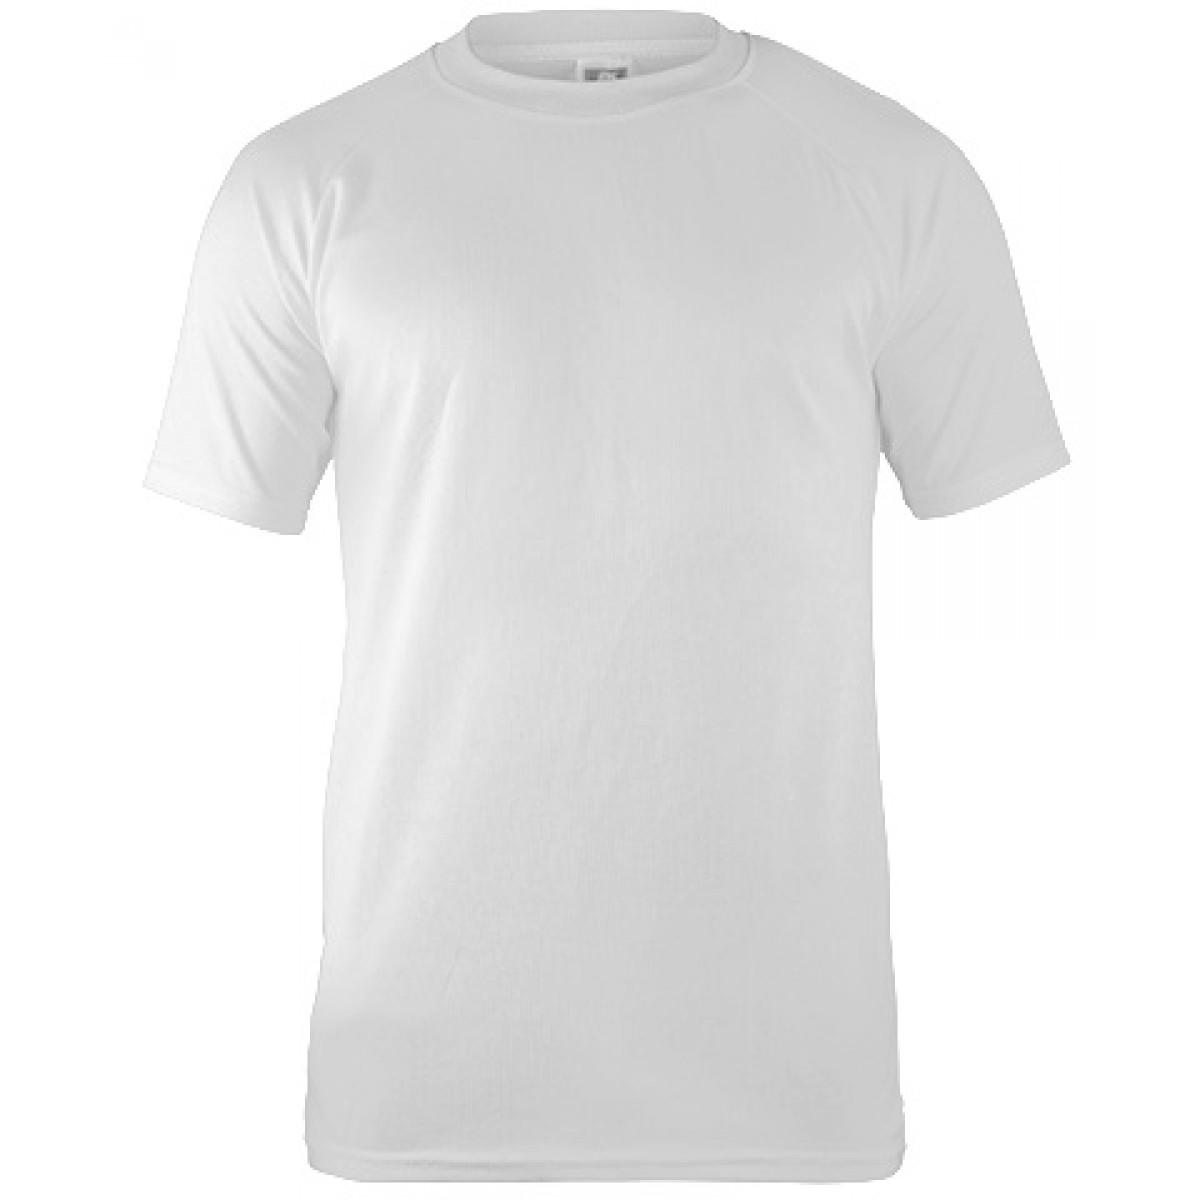 Short Sleeves Mesh Performance T-shirt-White-S